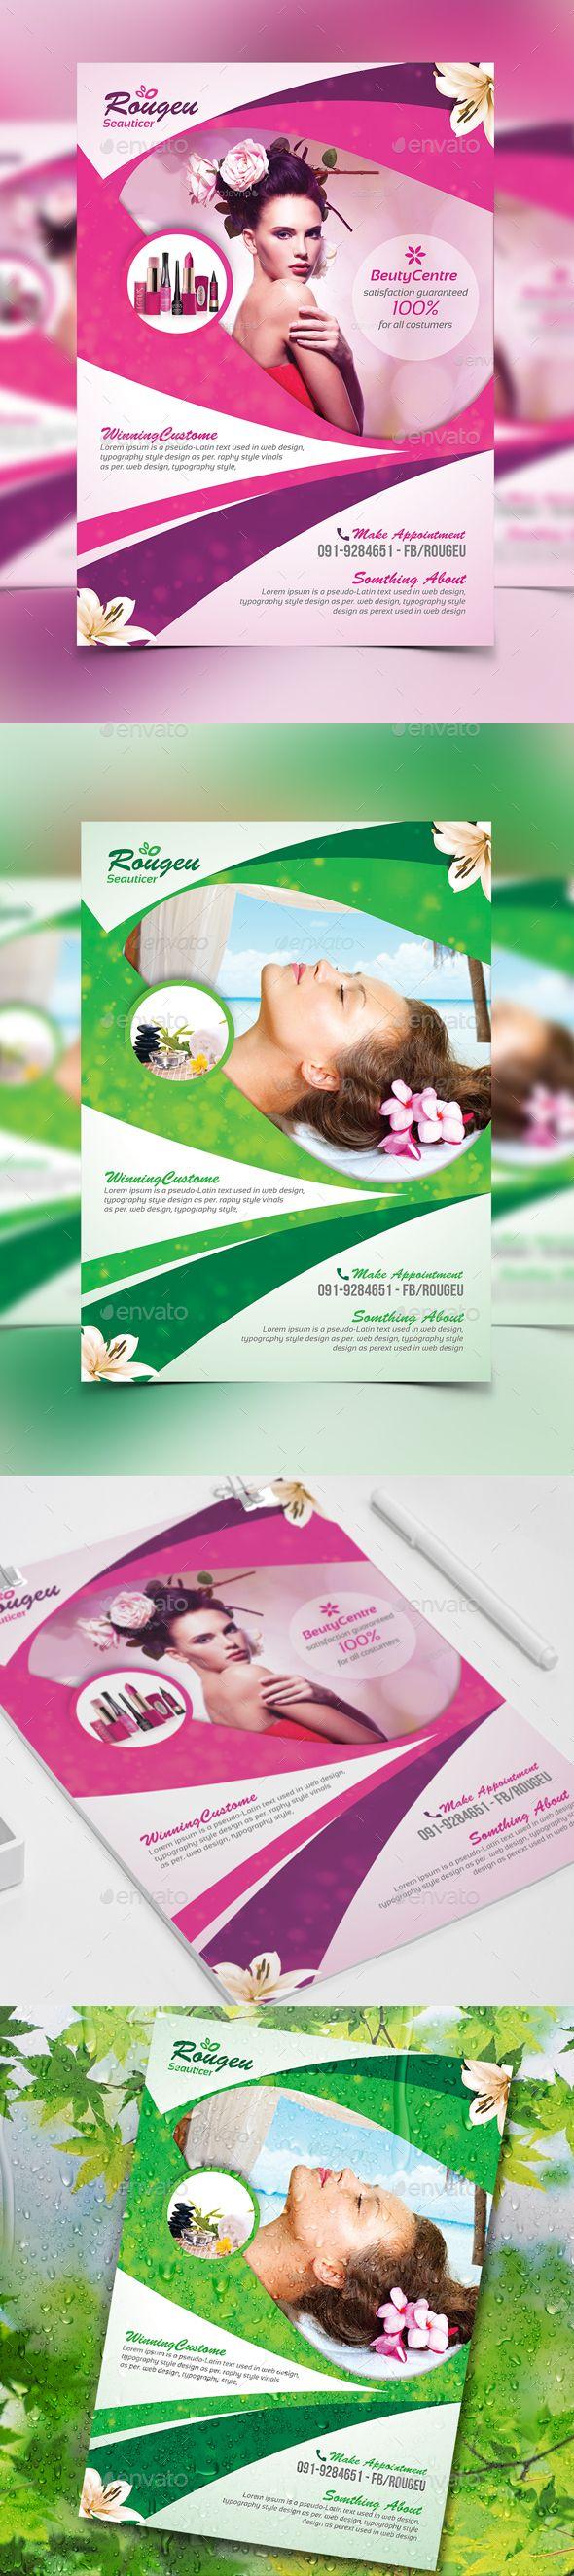 Beauty Salon Spa - Flyer Template PSD #design Download: http://graphicriver.net/item/beauty-salon-spa-flyer/13931580?ref=ksioks